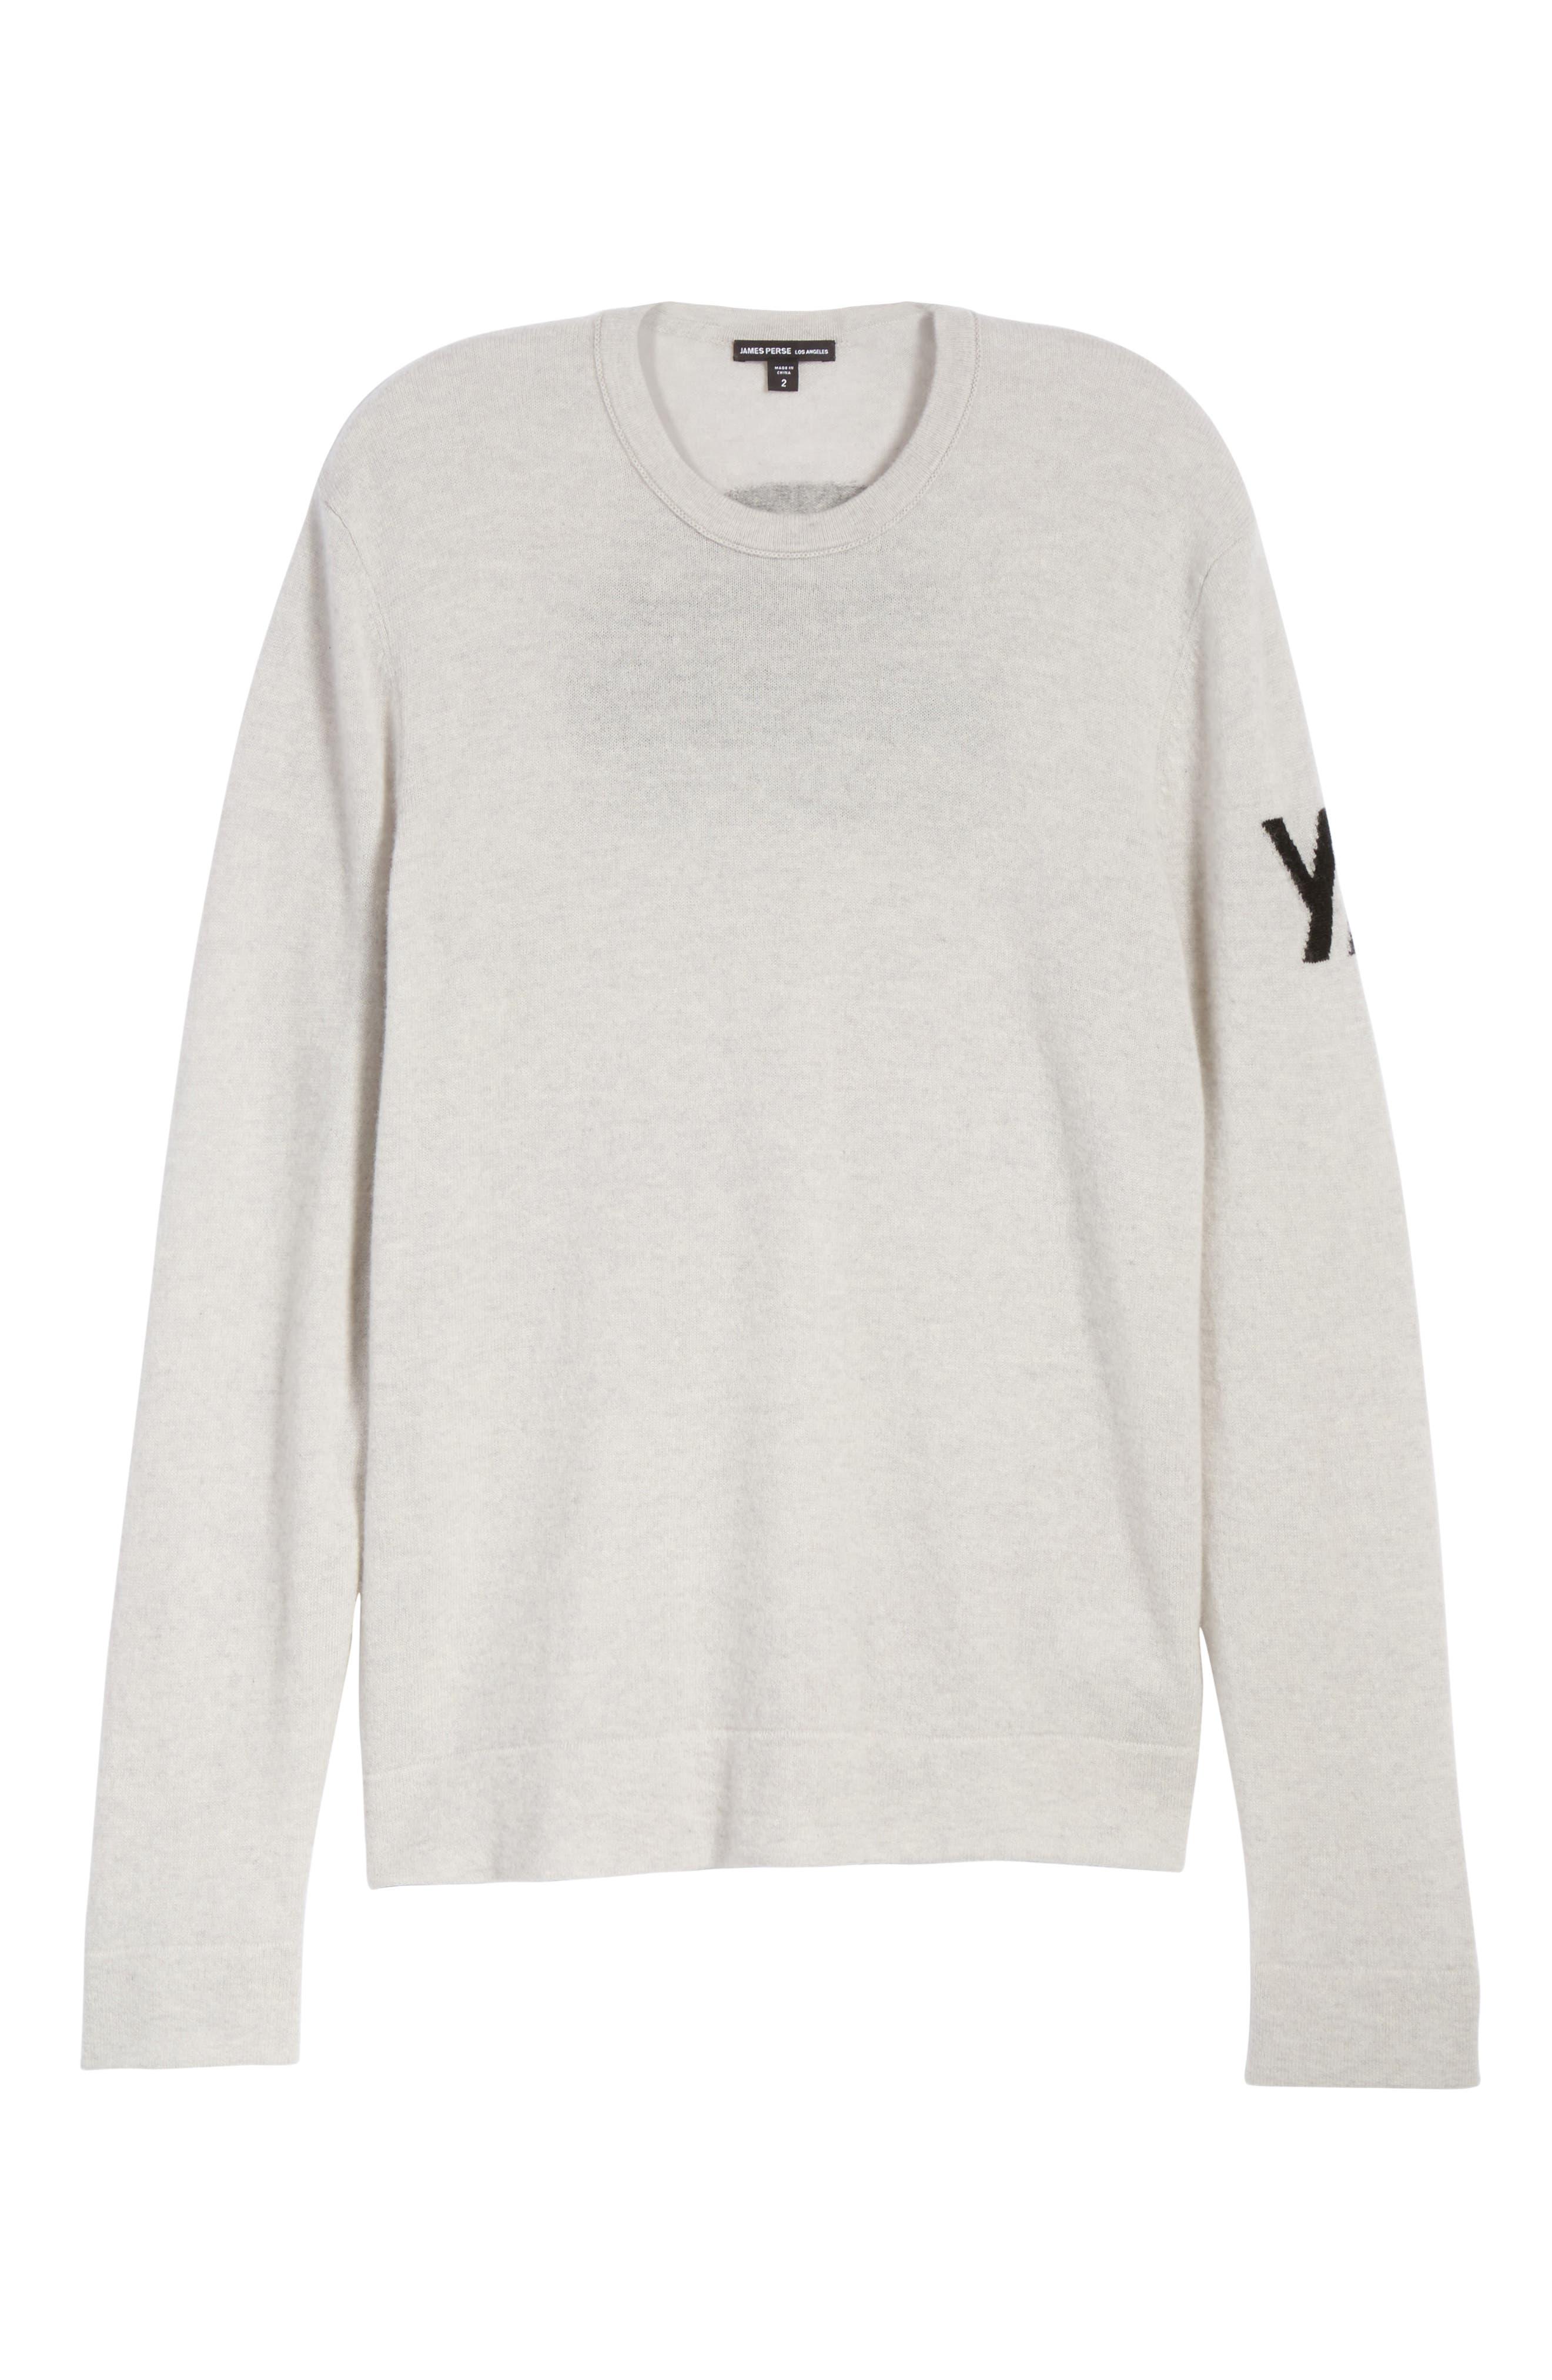 Intarsia Cashmere Sweater,                             Alternate thumbnail 6, color,                             115